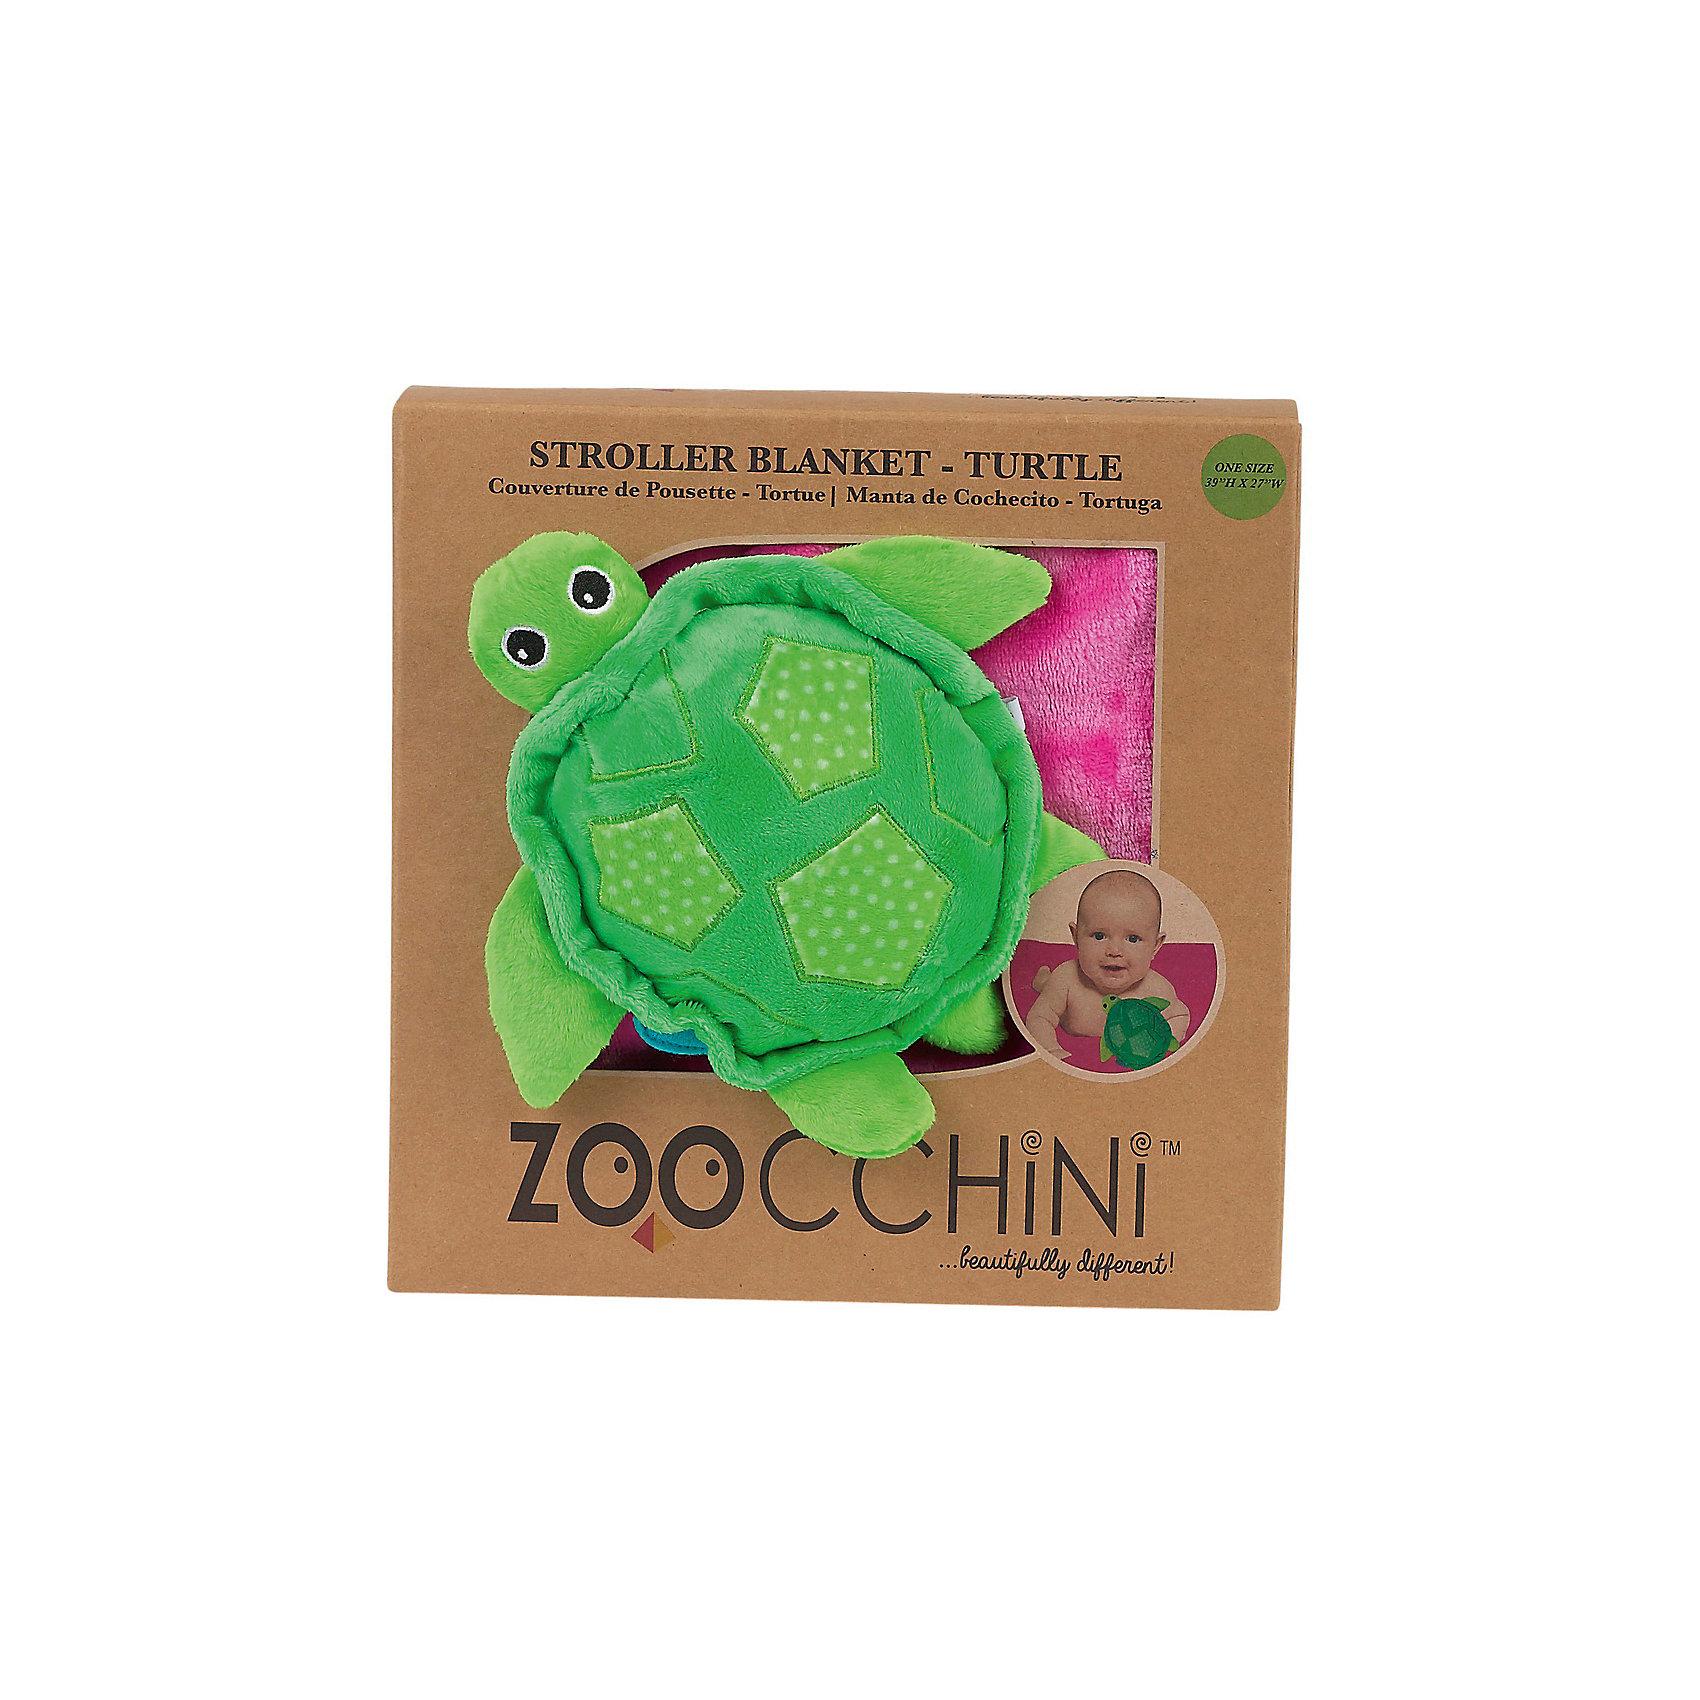 ������ � �������� ���������, Zoocchini, �������